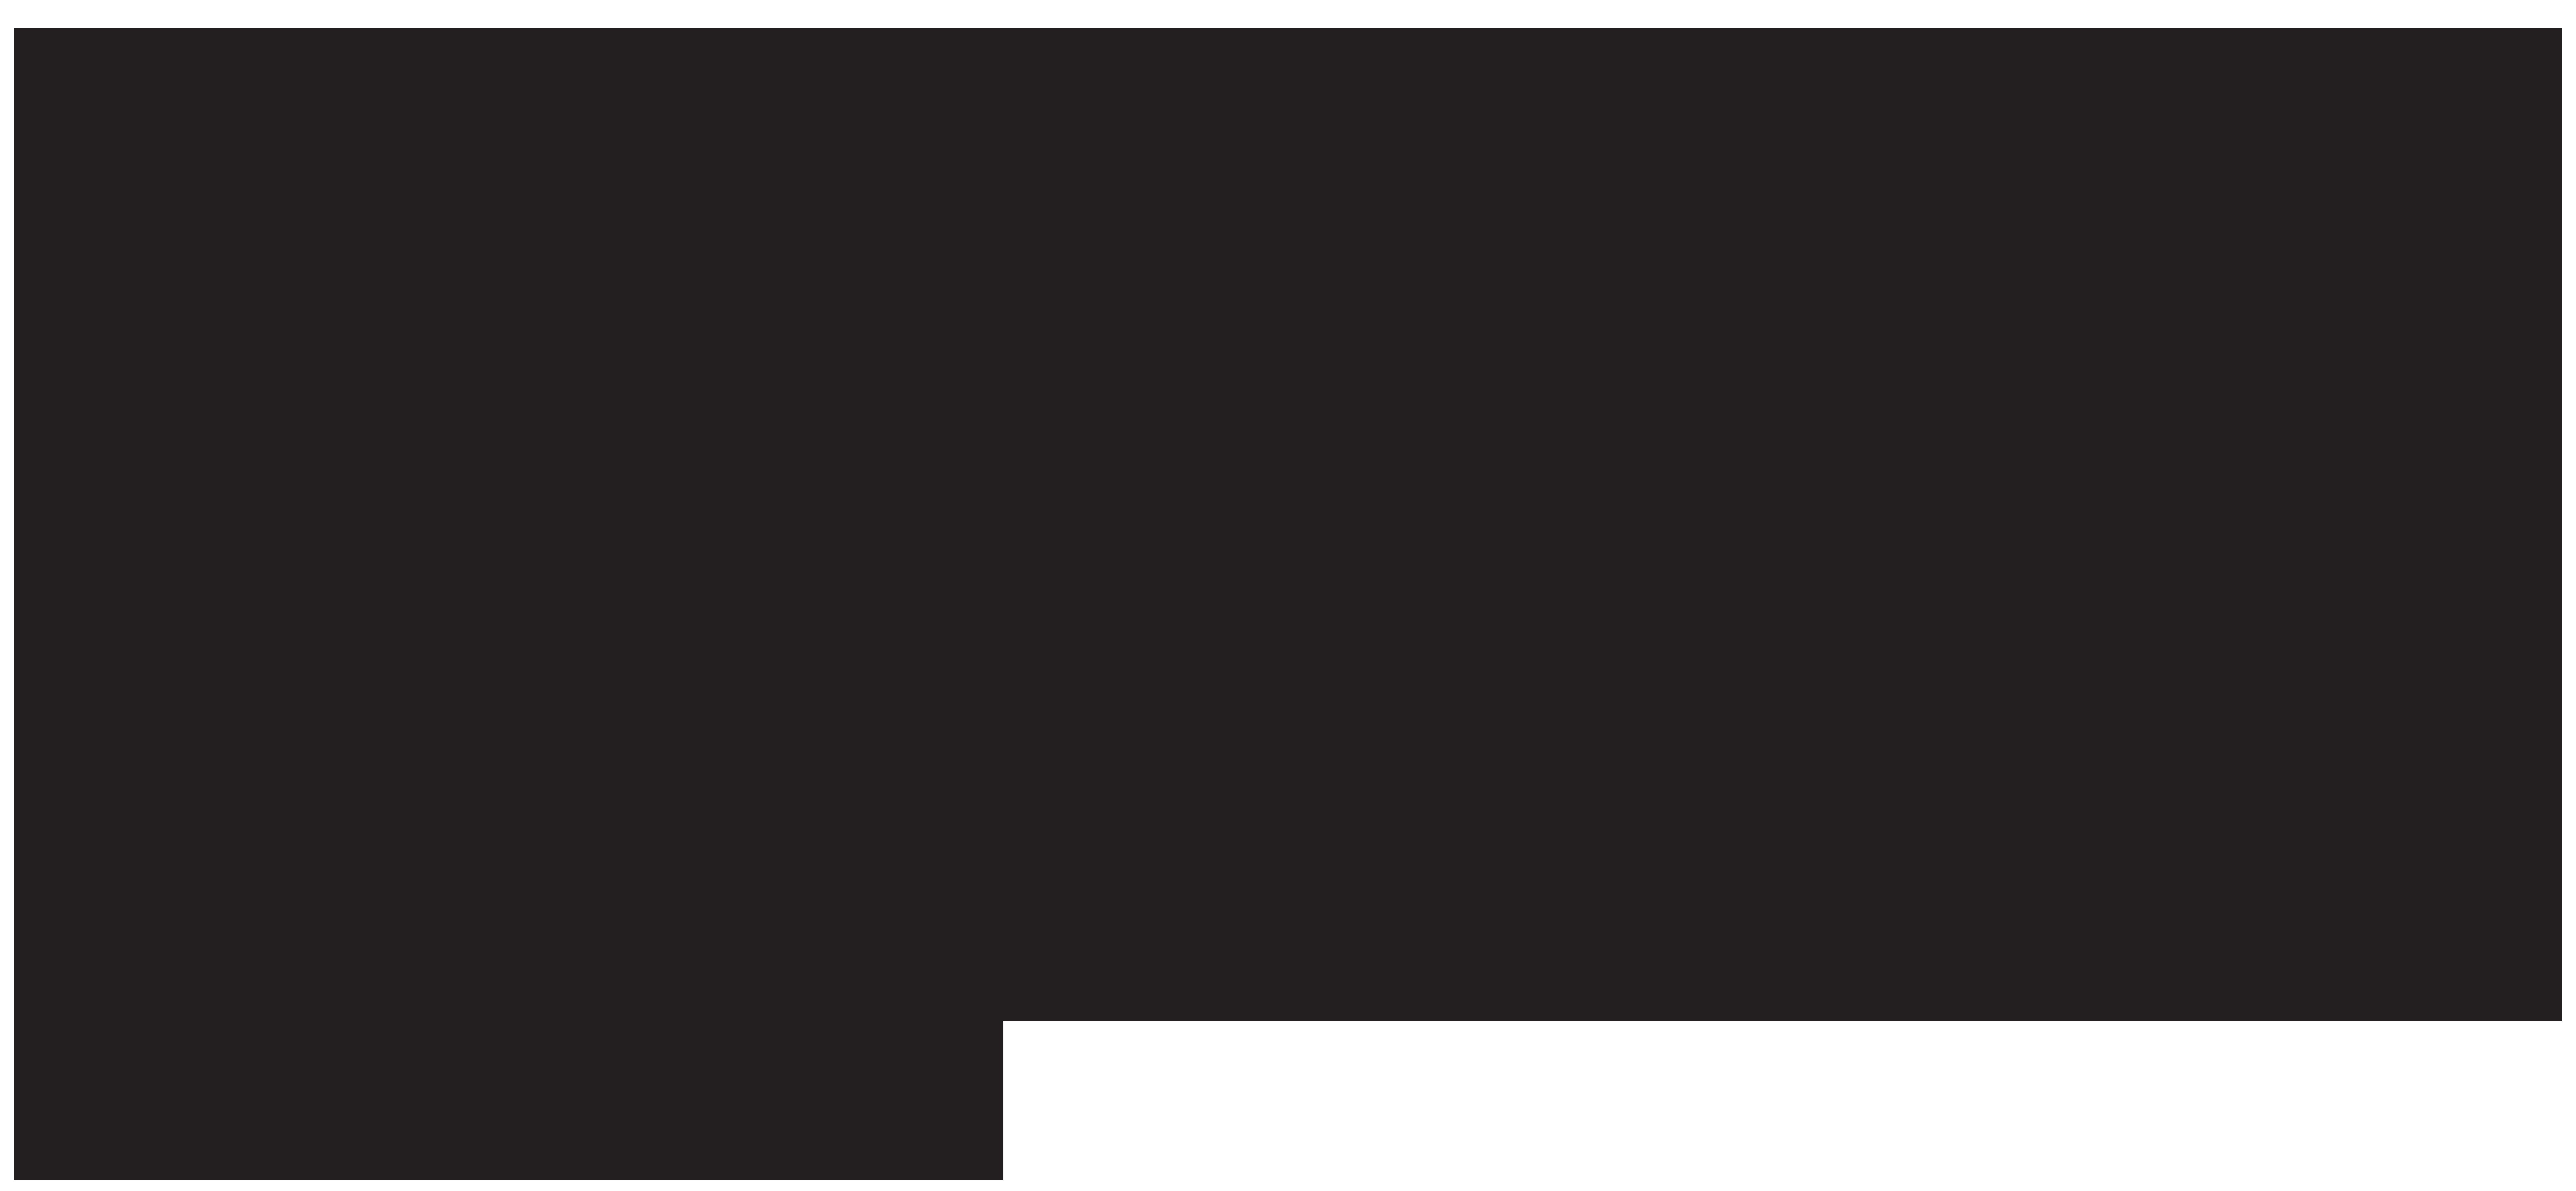 clipart free Beard clipart png. Set clip art image.